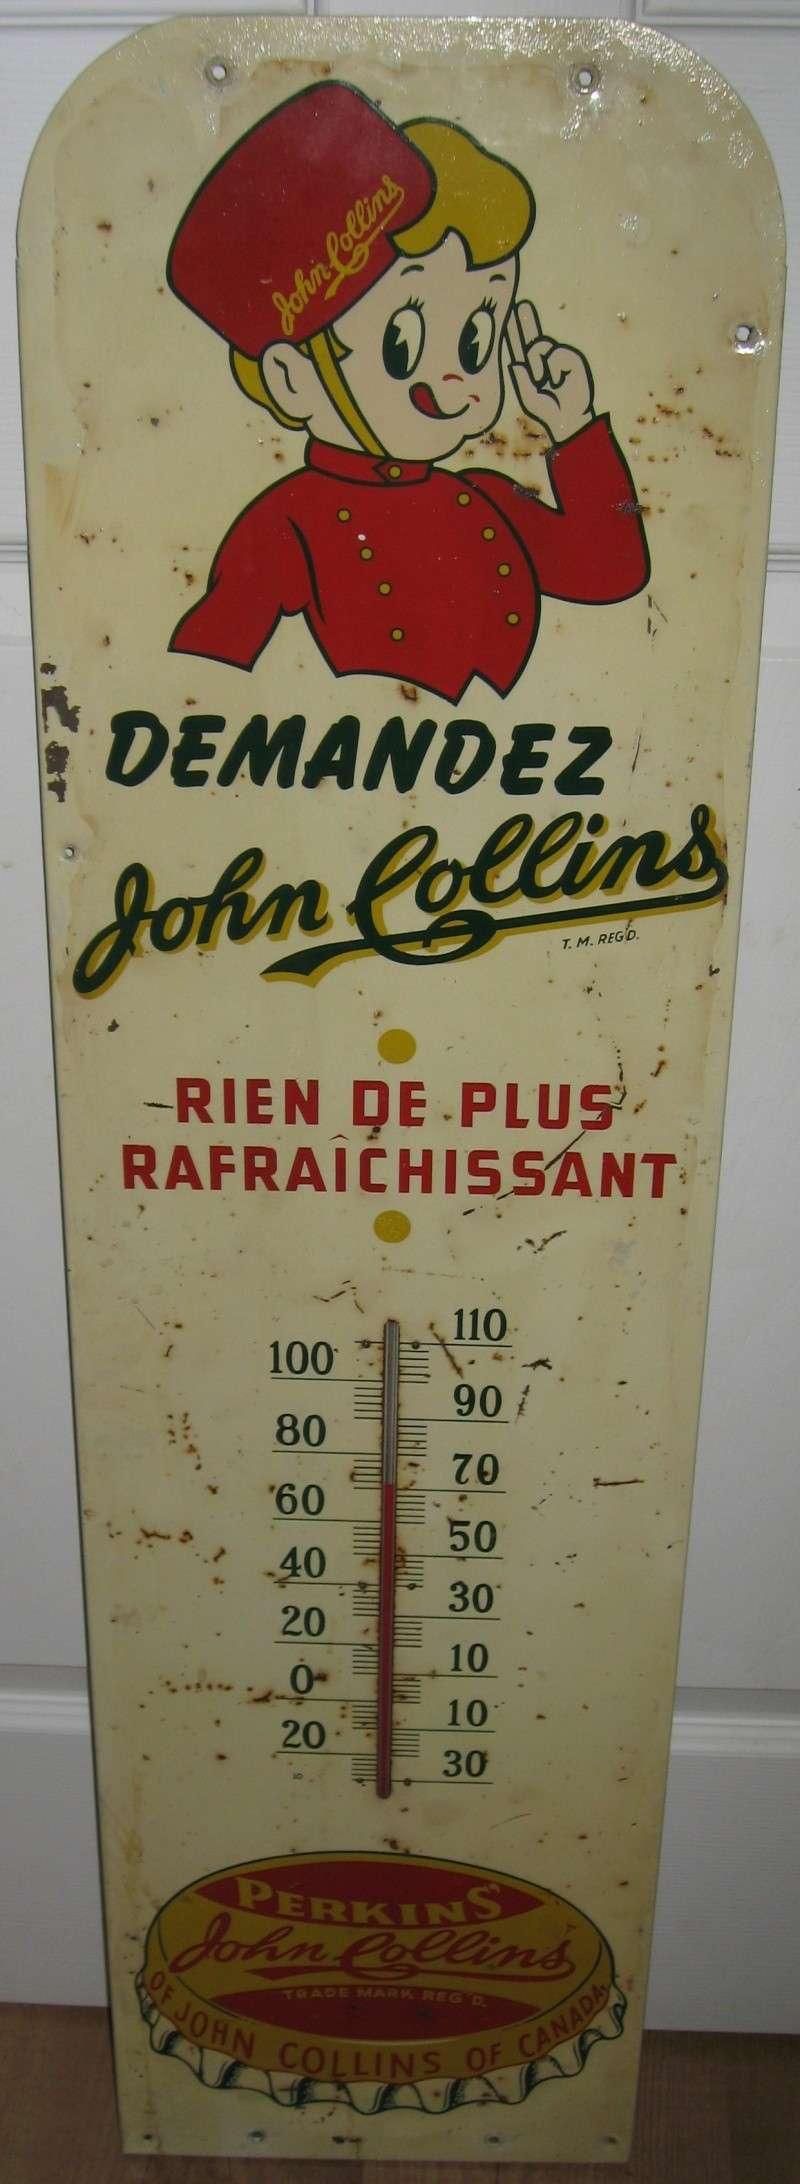 john collins  Img_8312